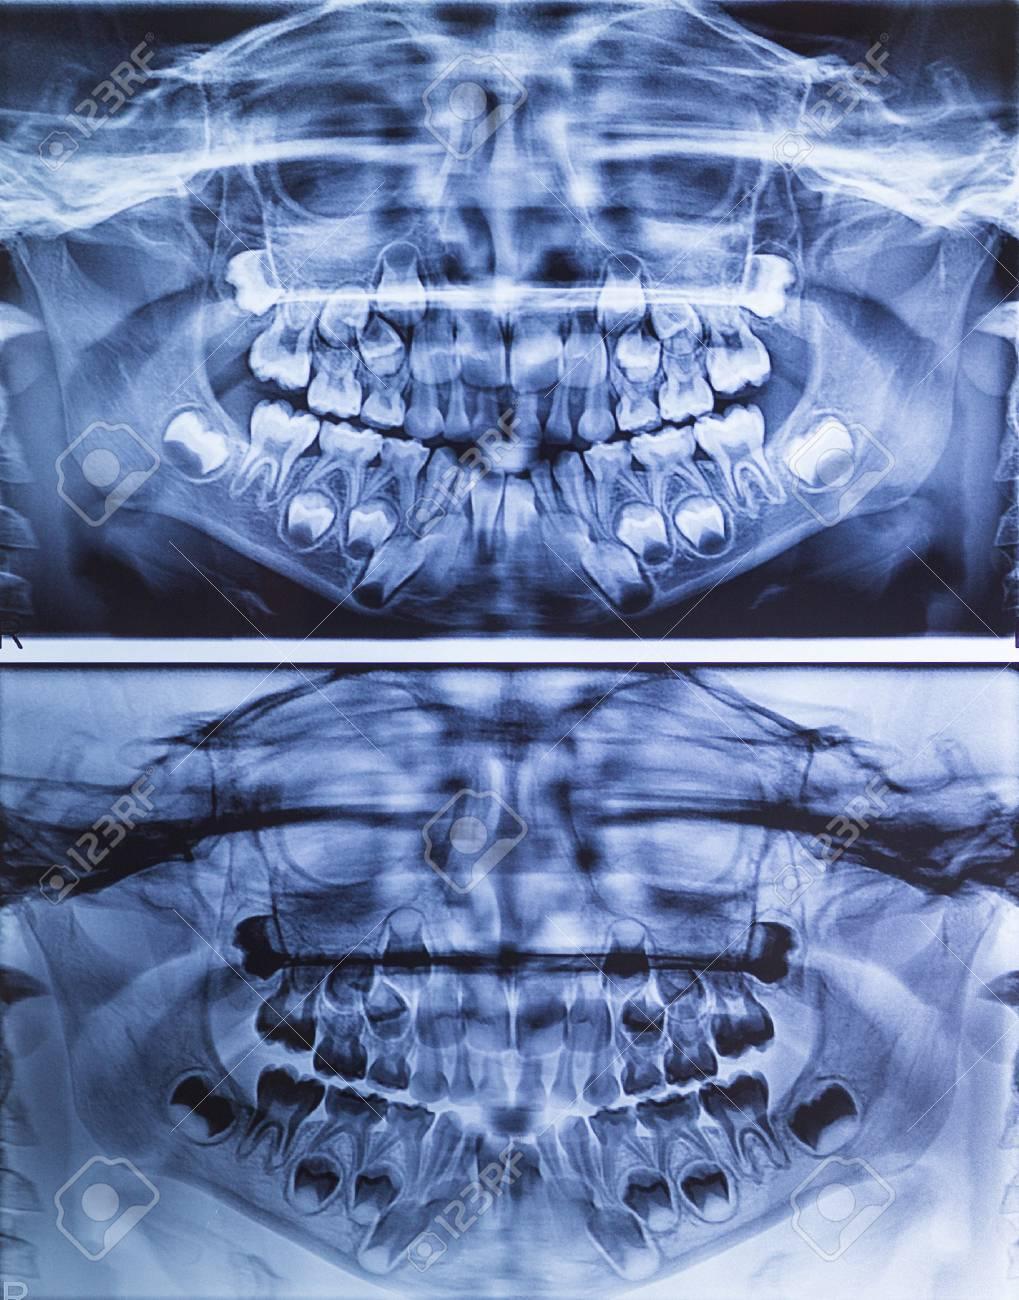 Dental Panorámica De Rayos X De La Mandíbula Superior E Inferior ...